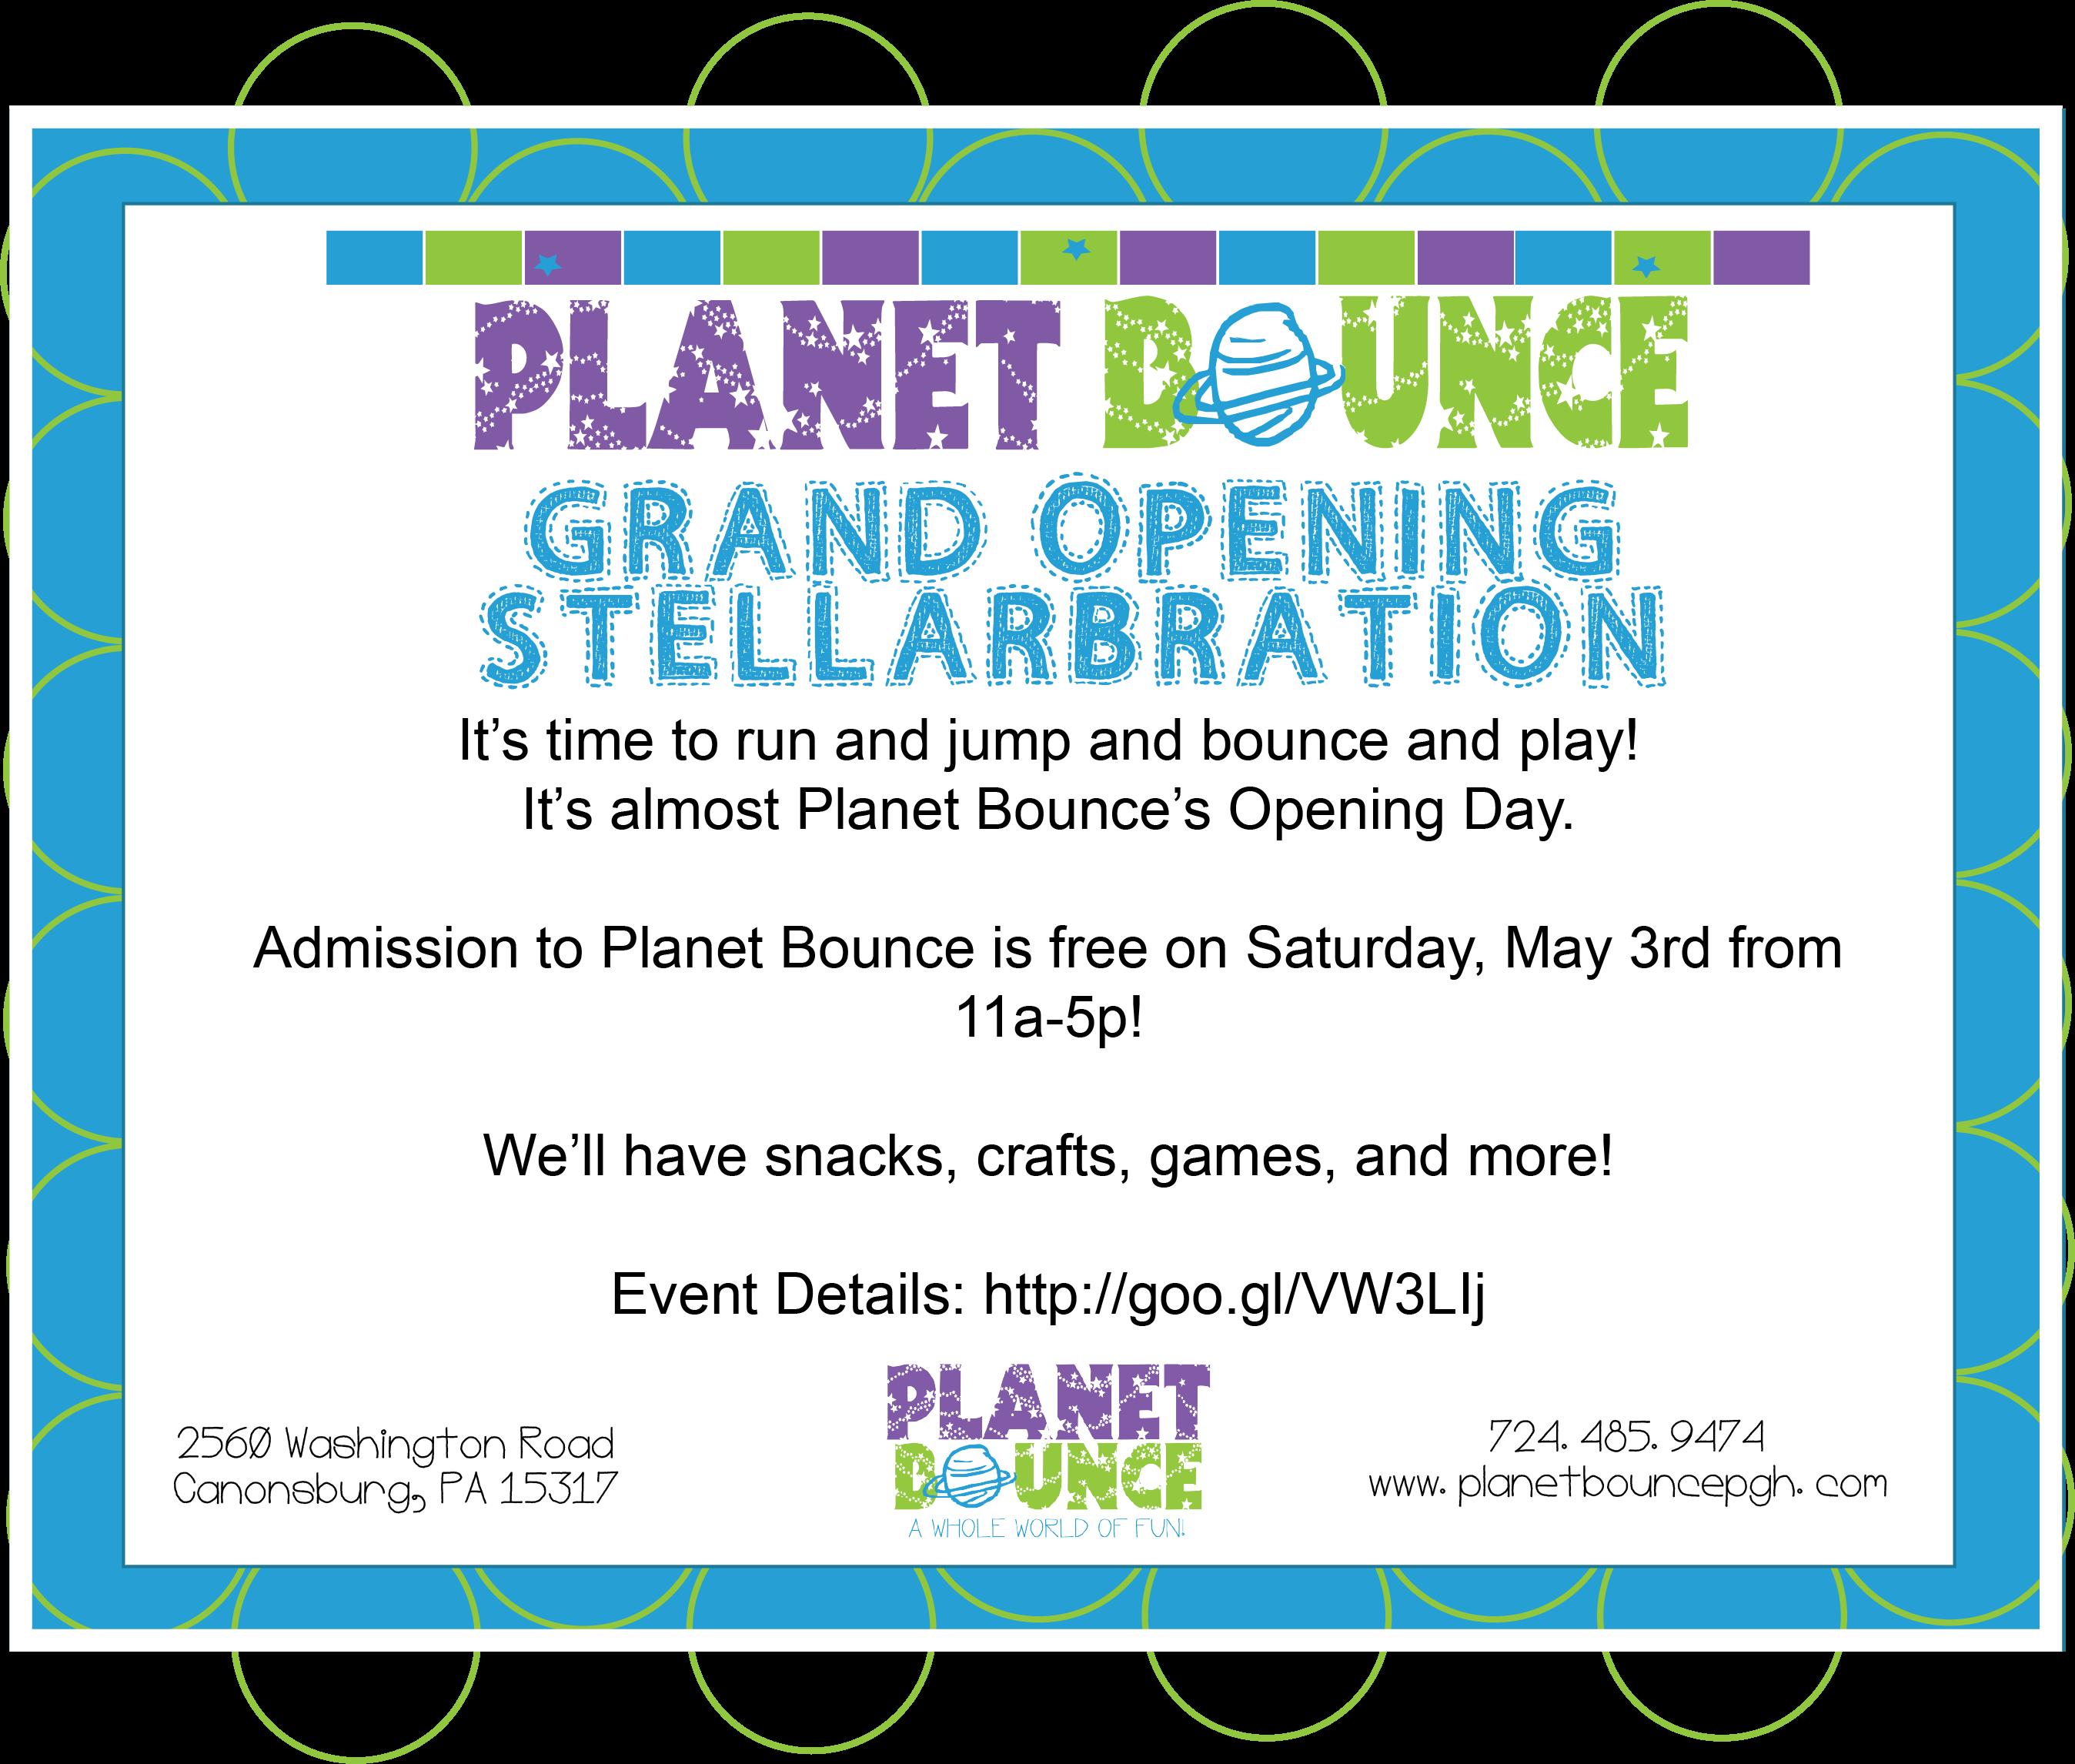 Planet Bounce Stellarbration